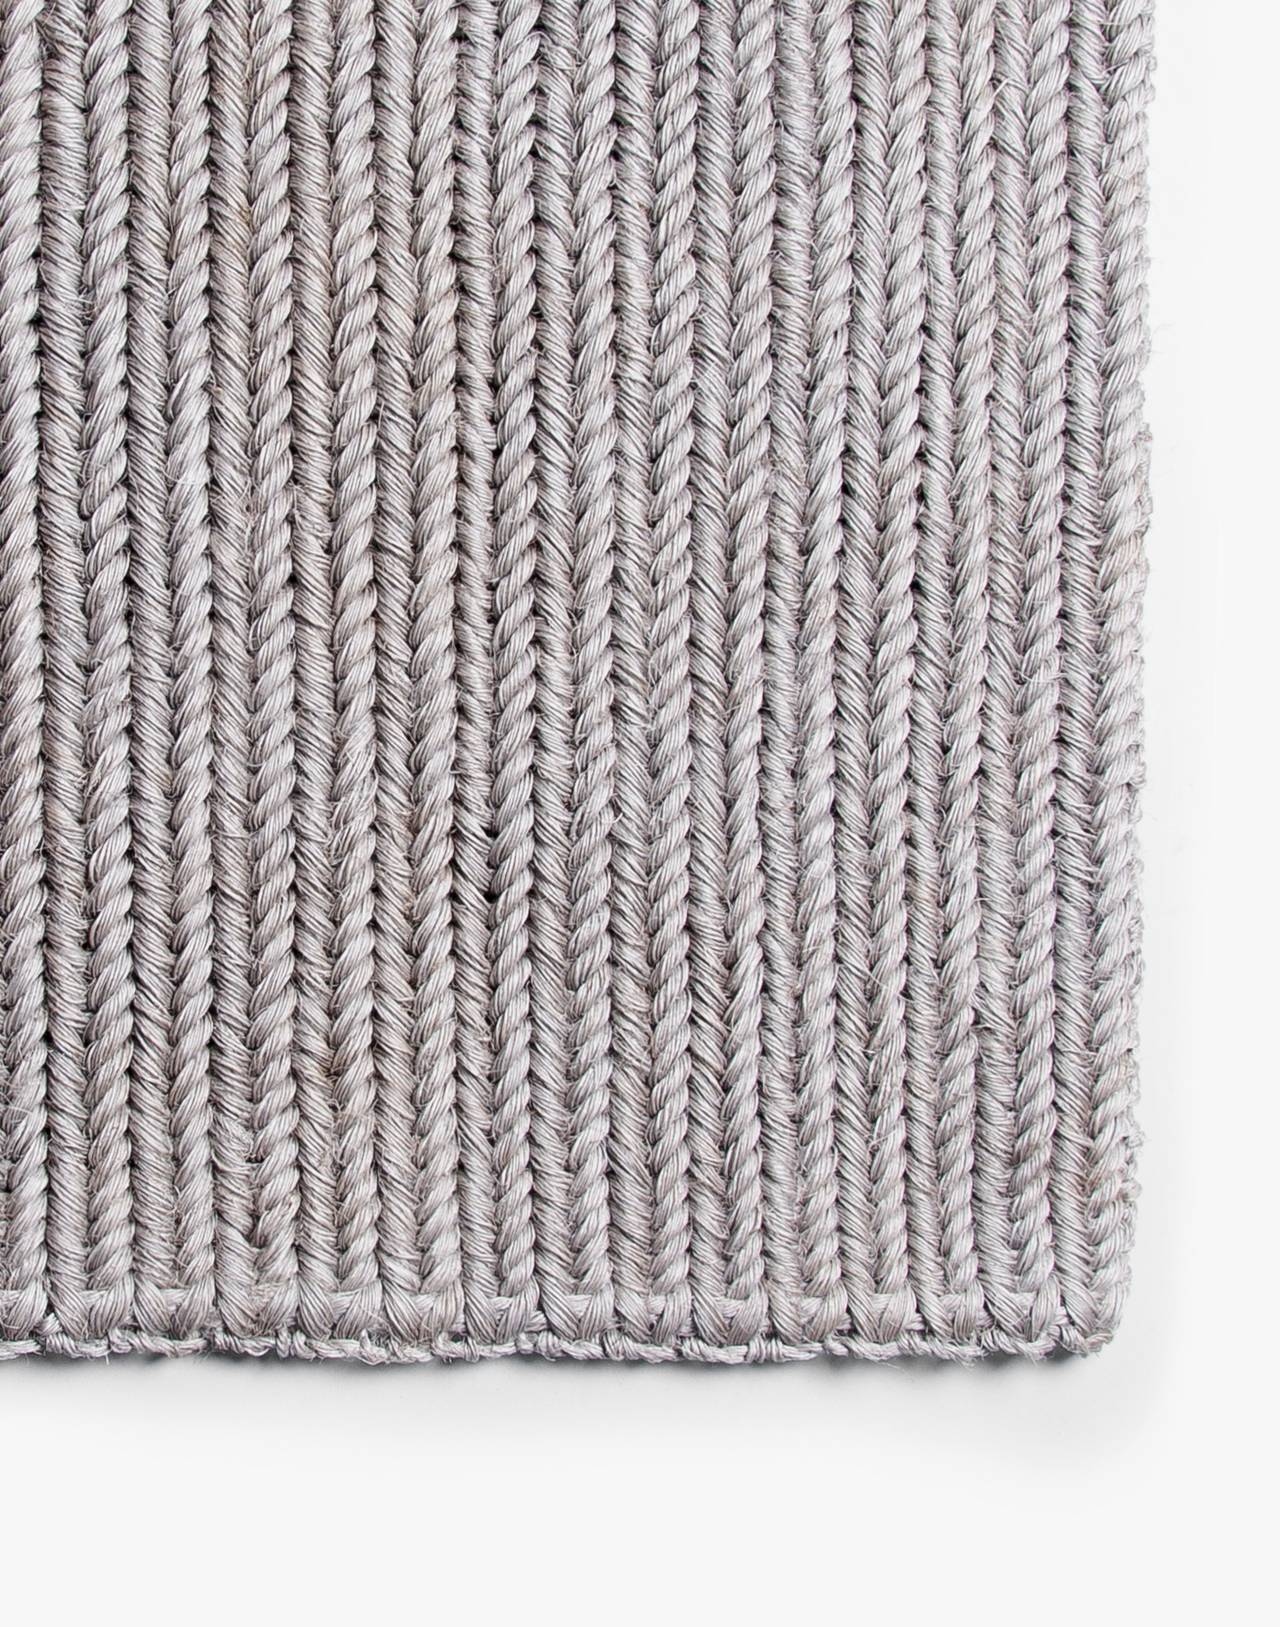 SOMEWARE™ Braided Doormat in grey image 1